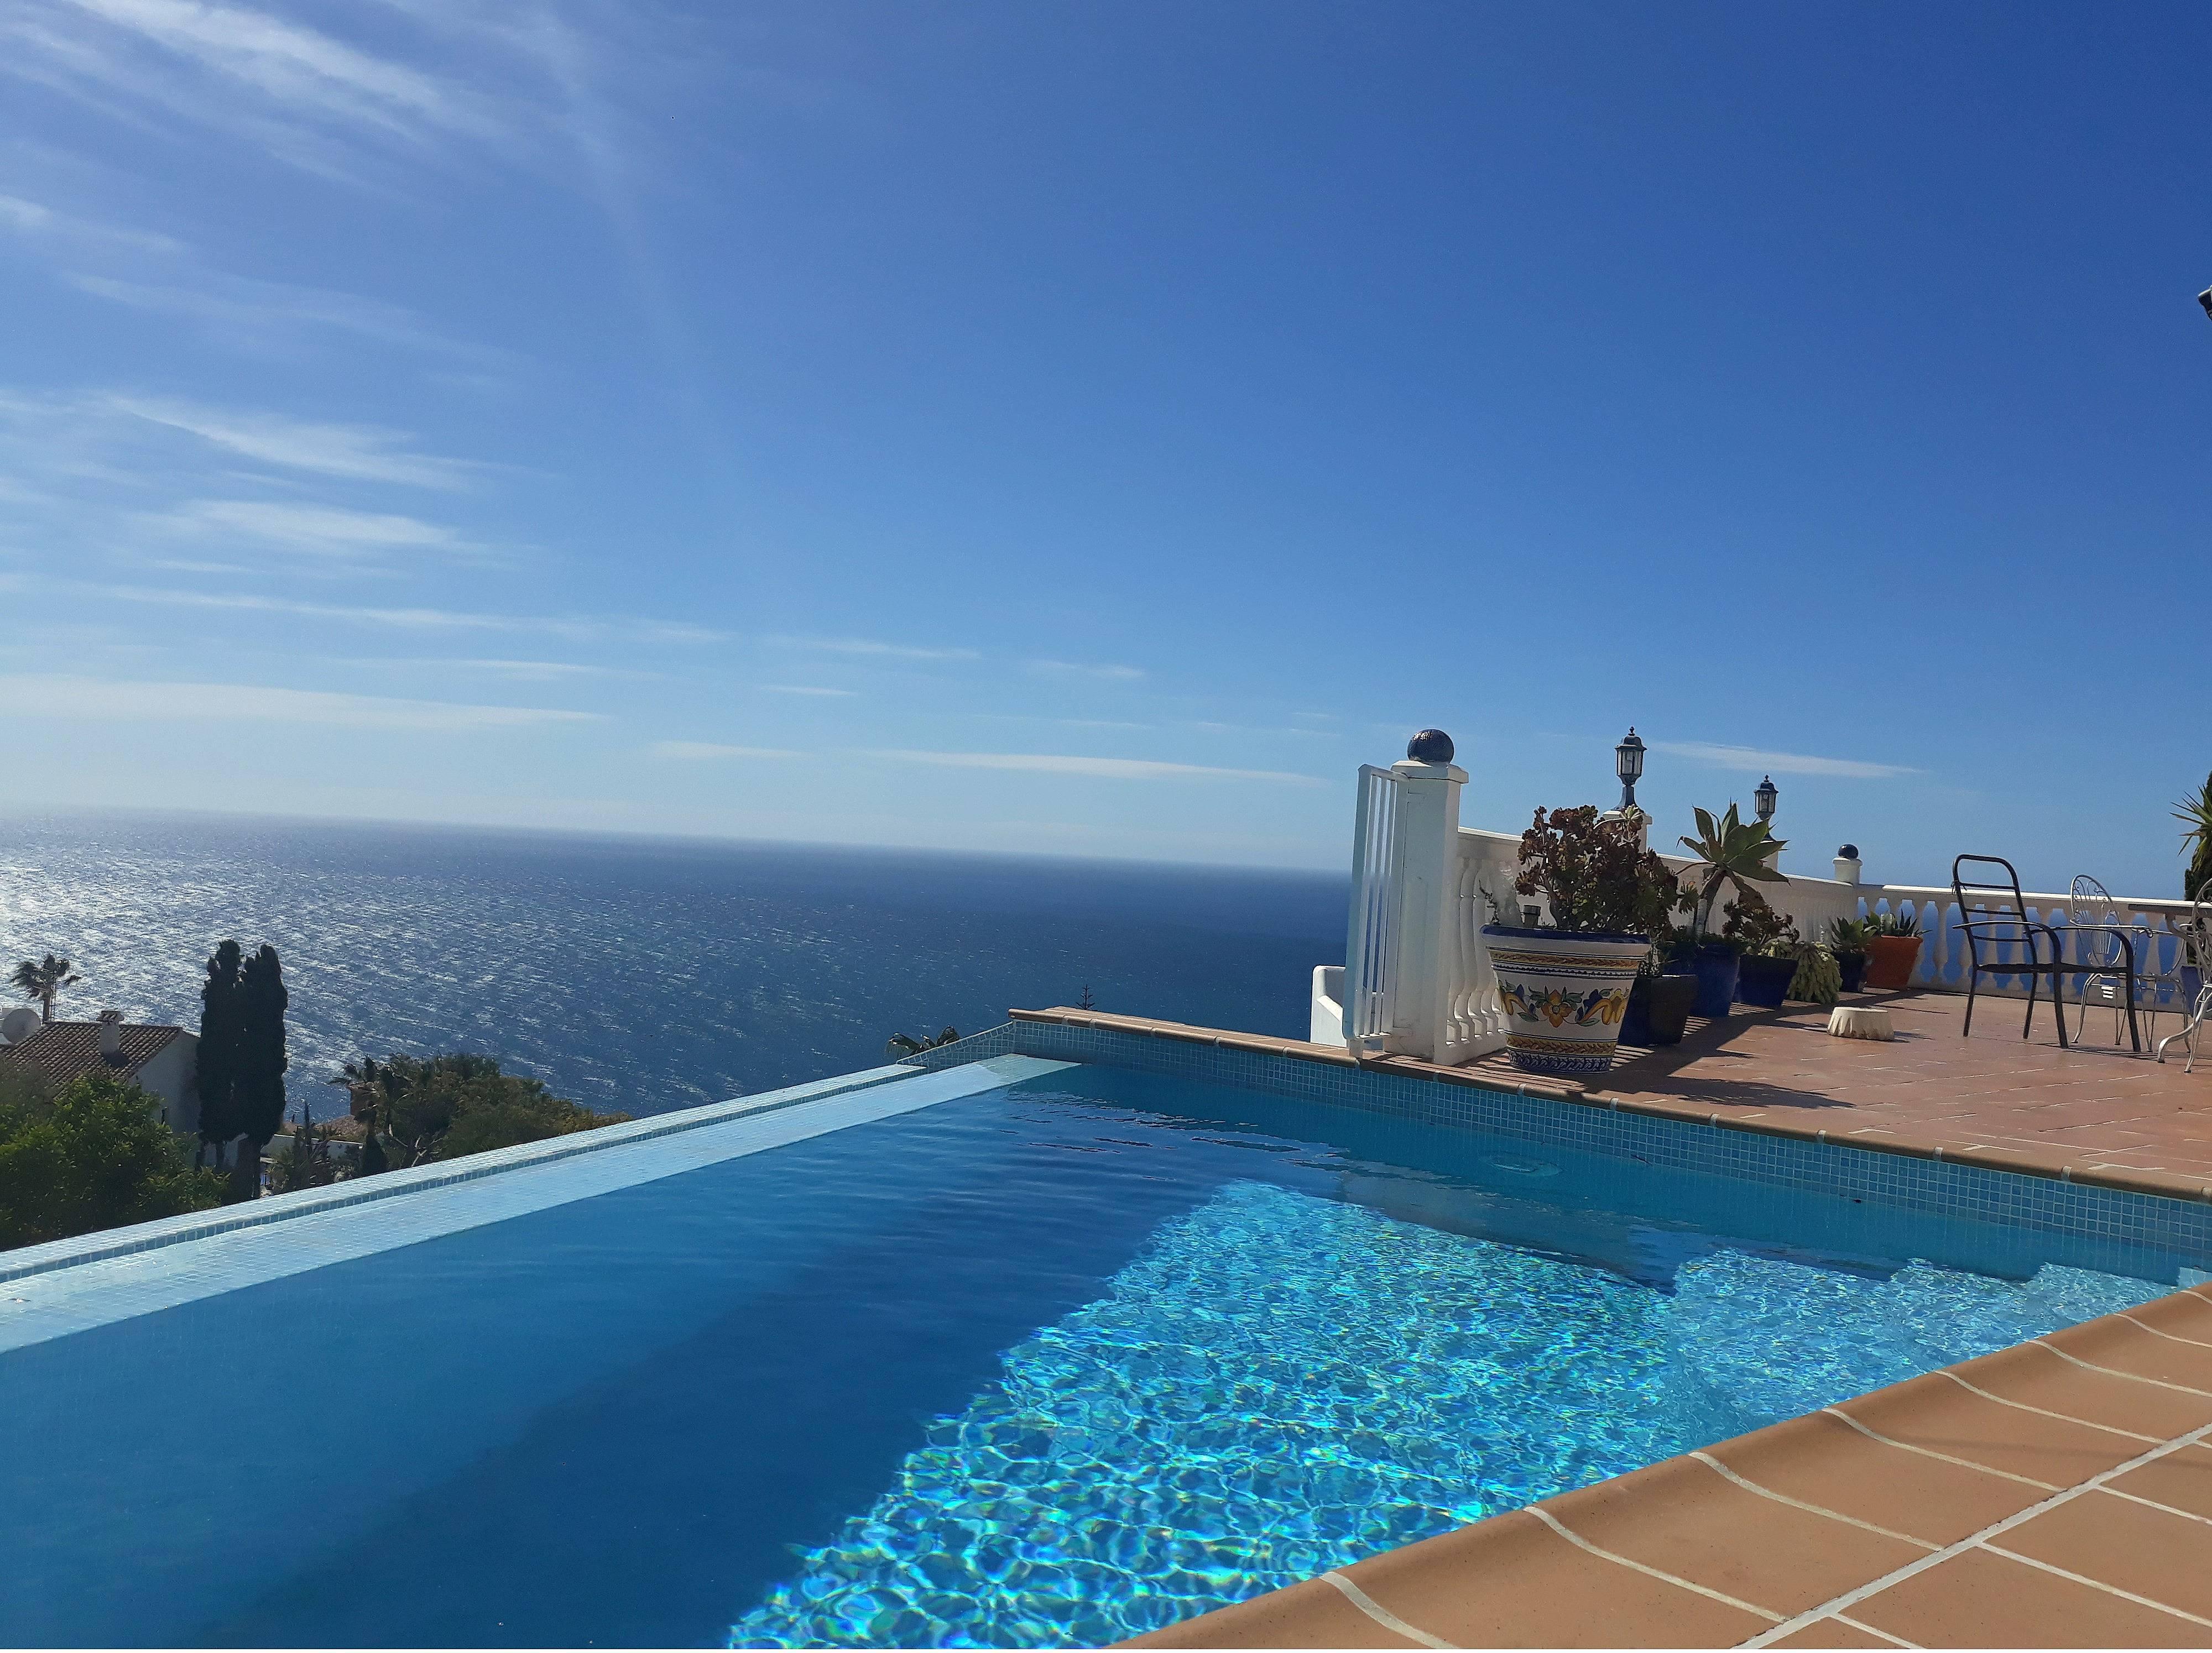 Modern villa overlooking the med with private pool - Salobreña (Granada)